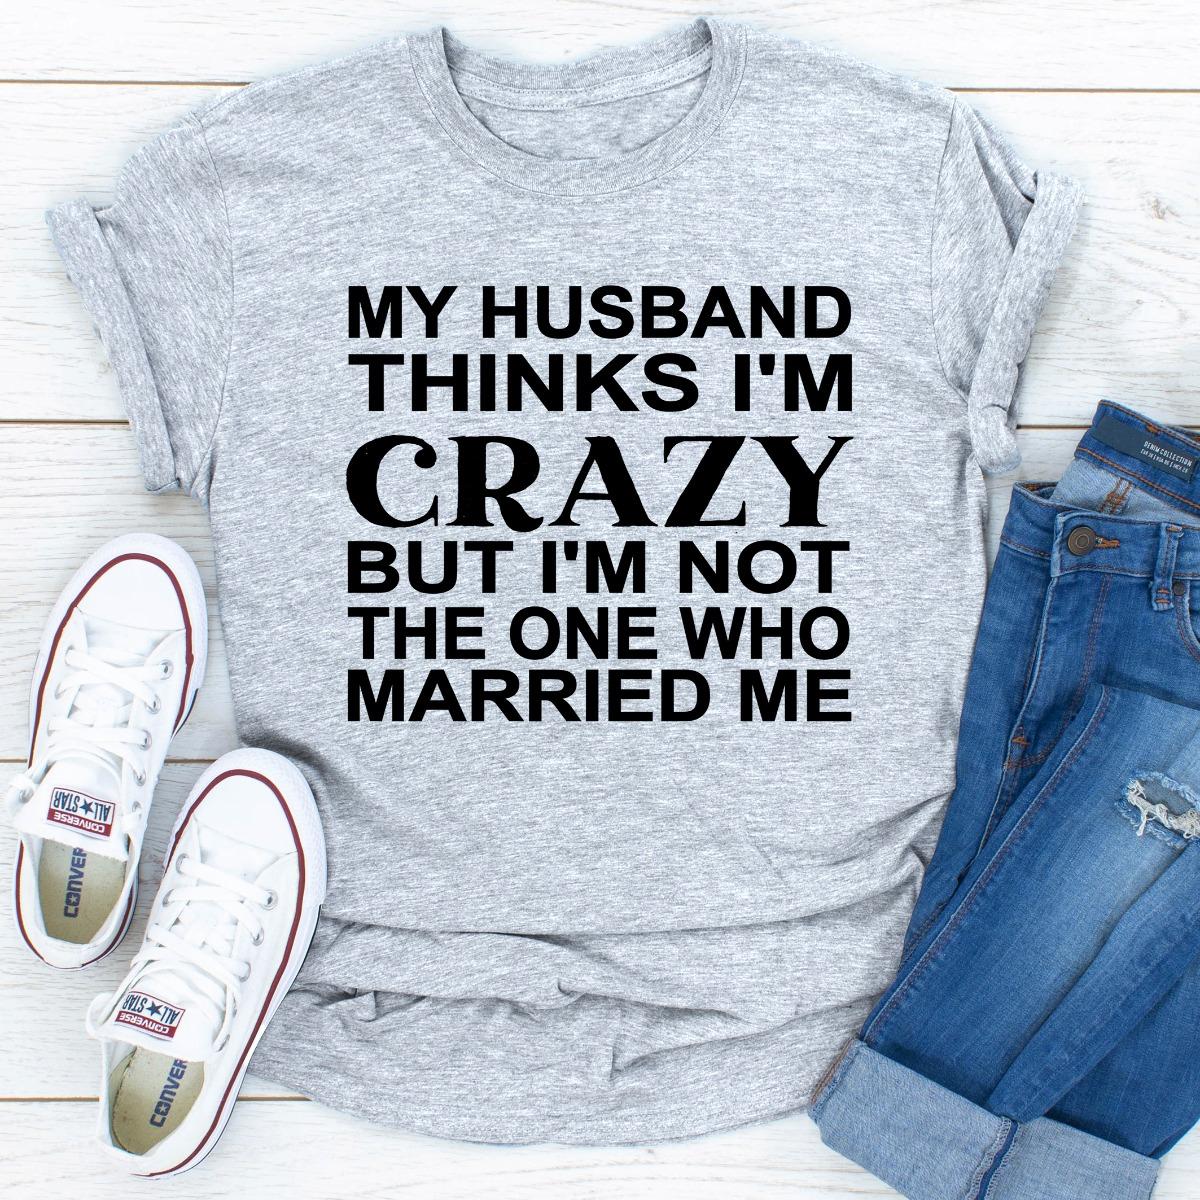 My Husband Thinks I'm Crazy (Sport Grey / S)